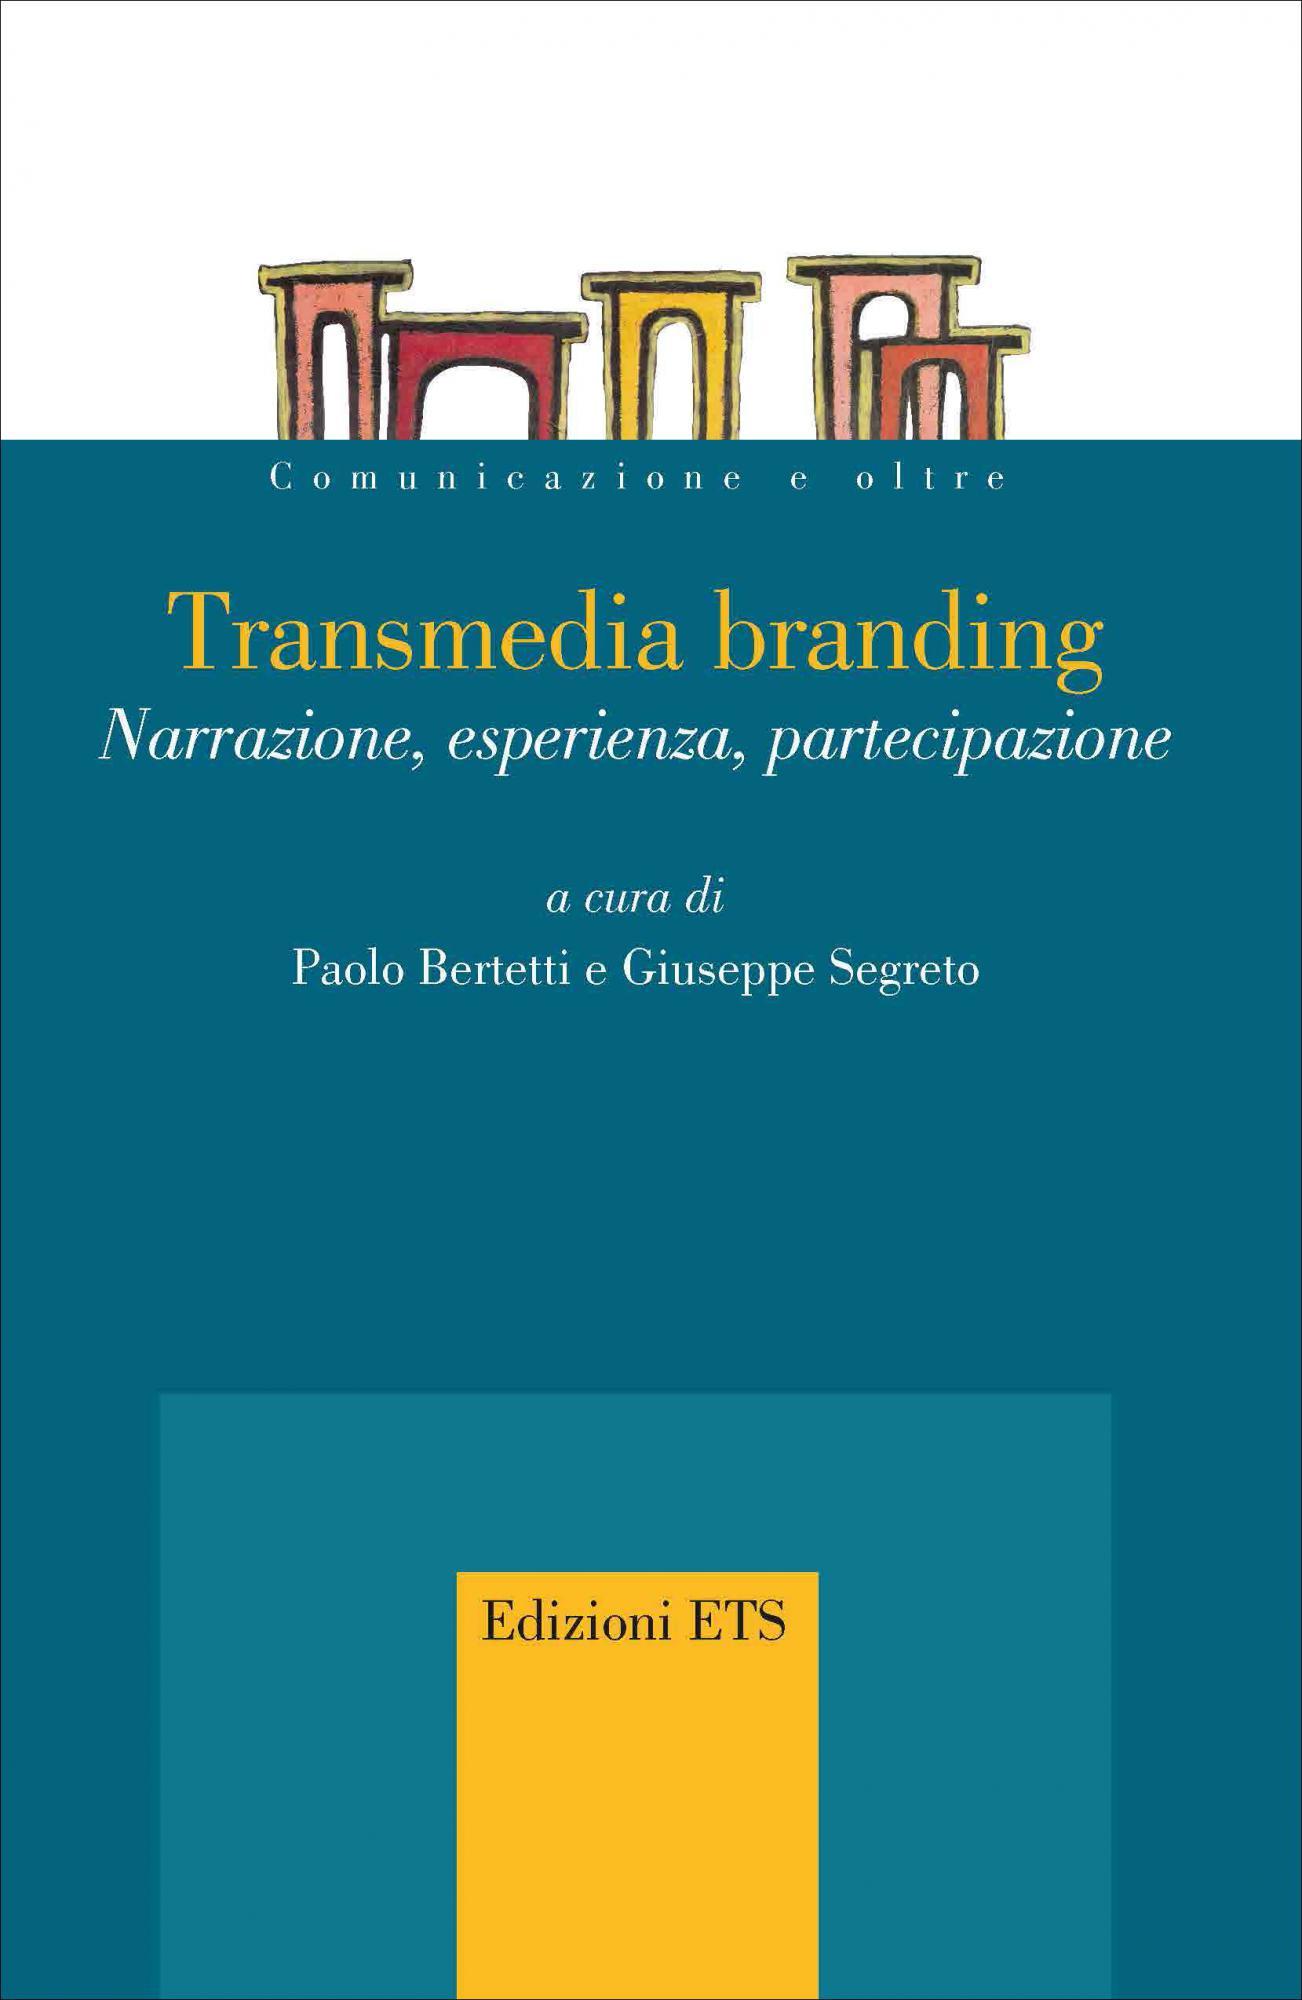 Transmedia branding.Narrazione, esperienza, partecipazione